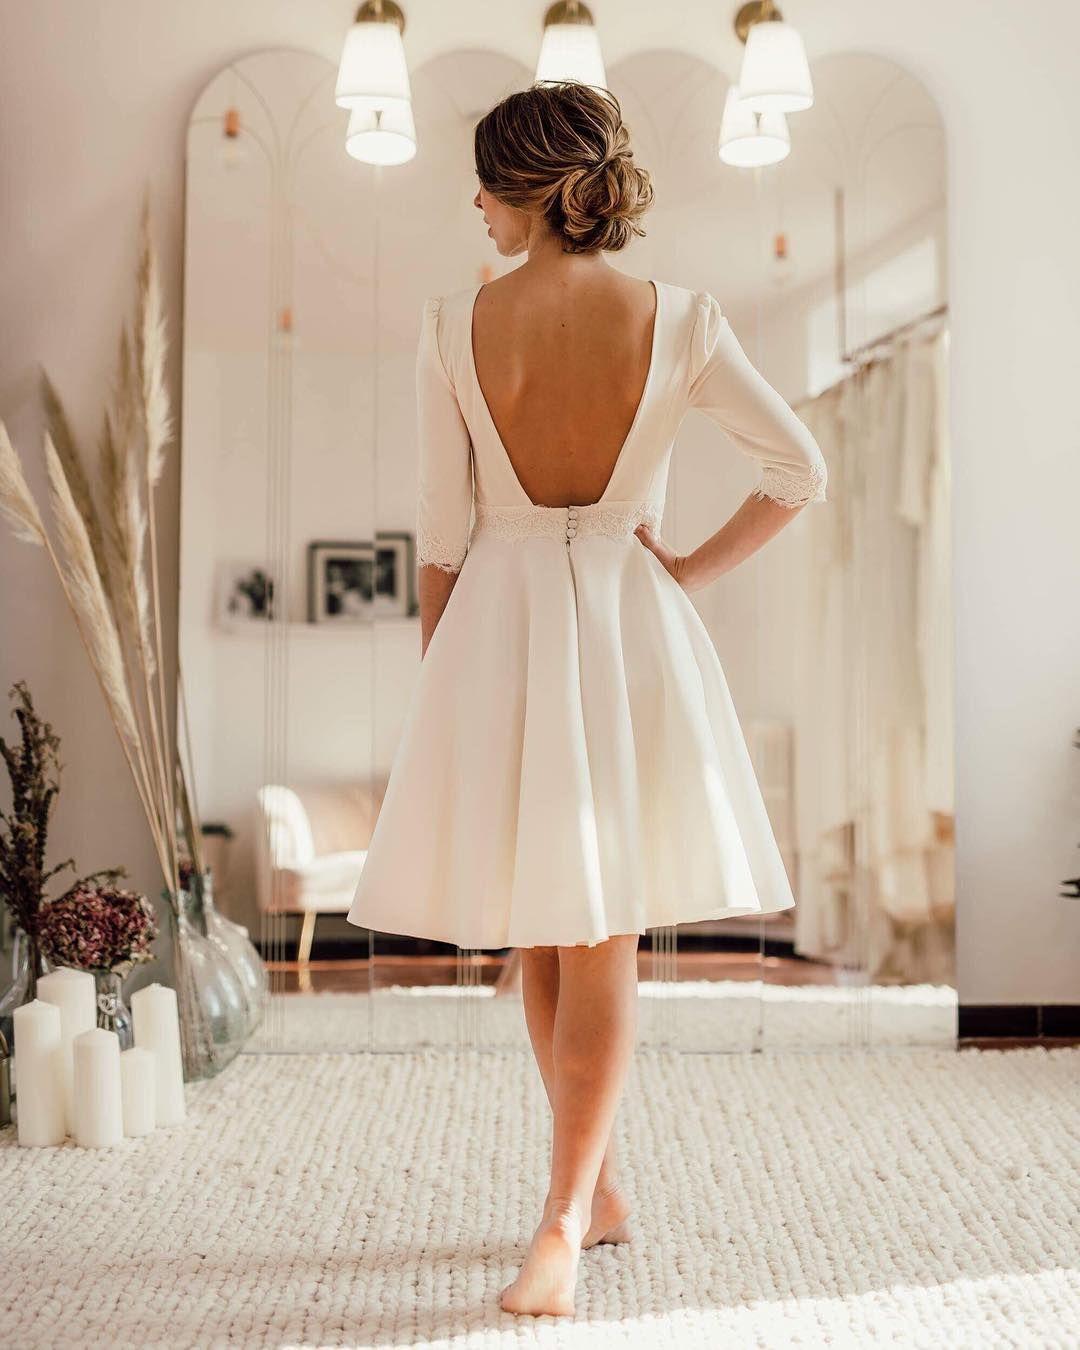 BECKY DRESS~ follow almagabriela96 for more